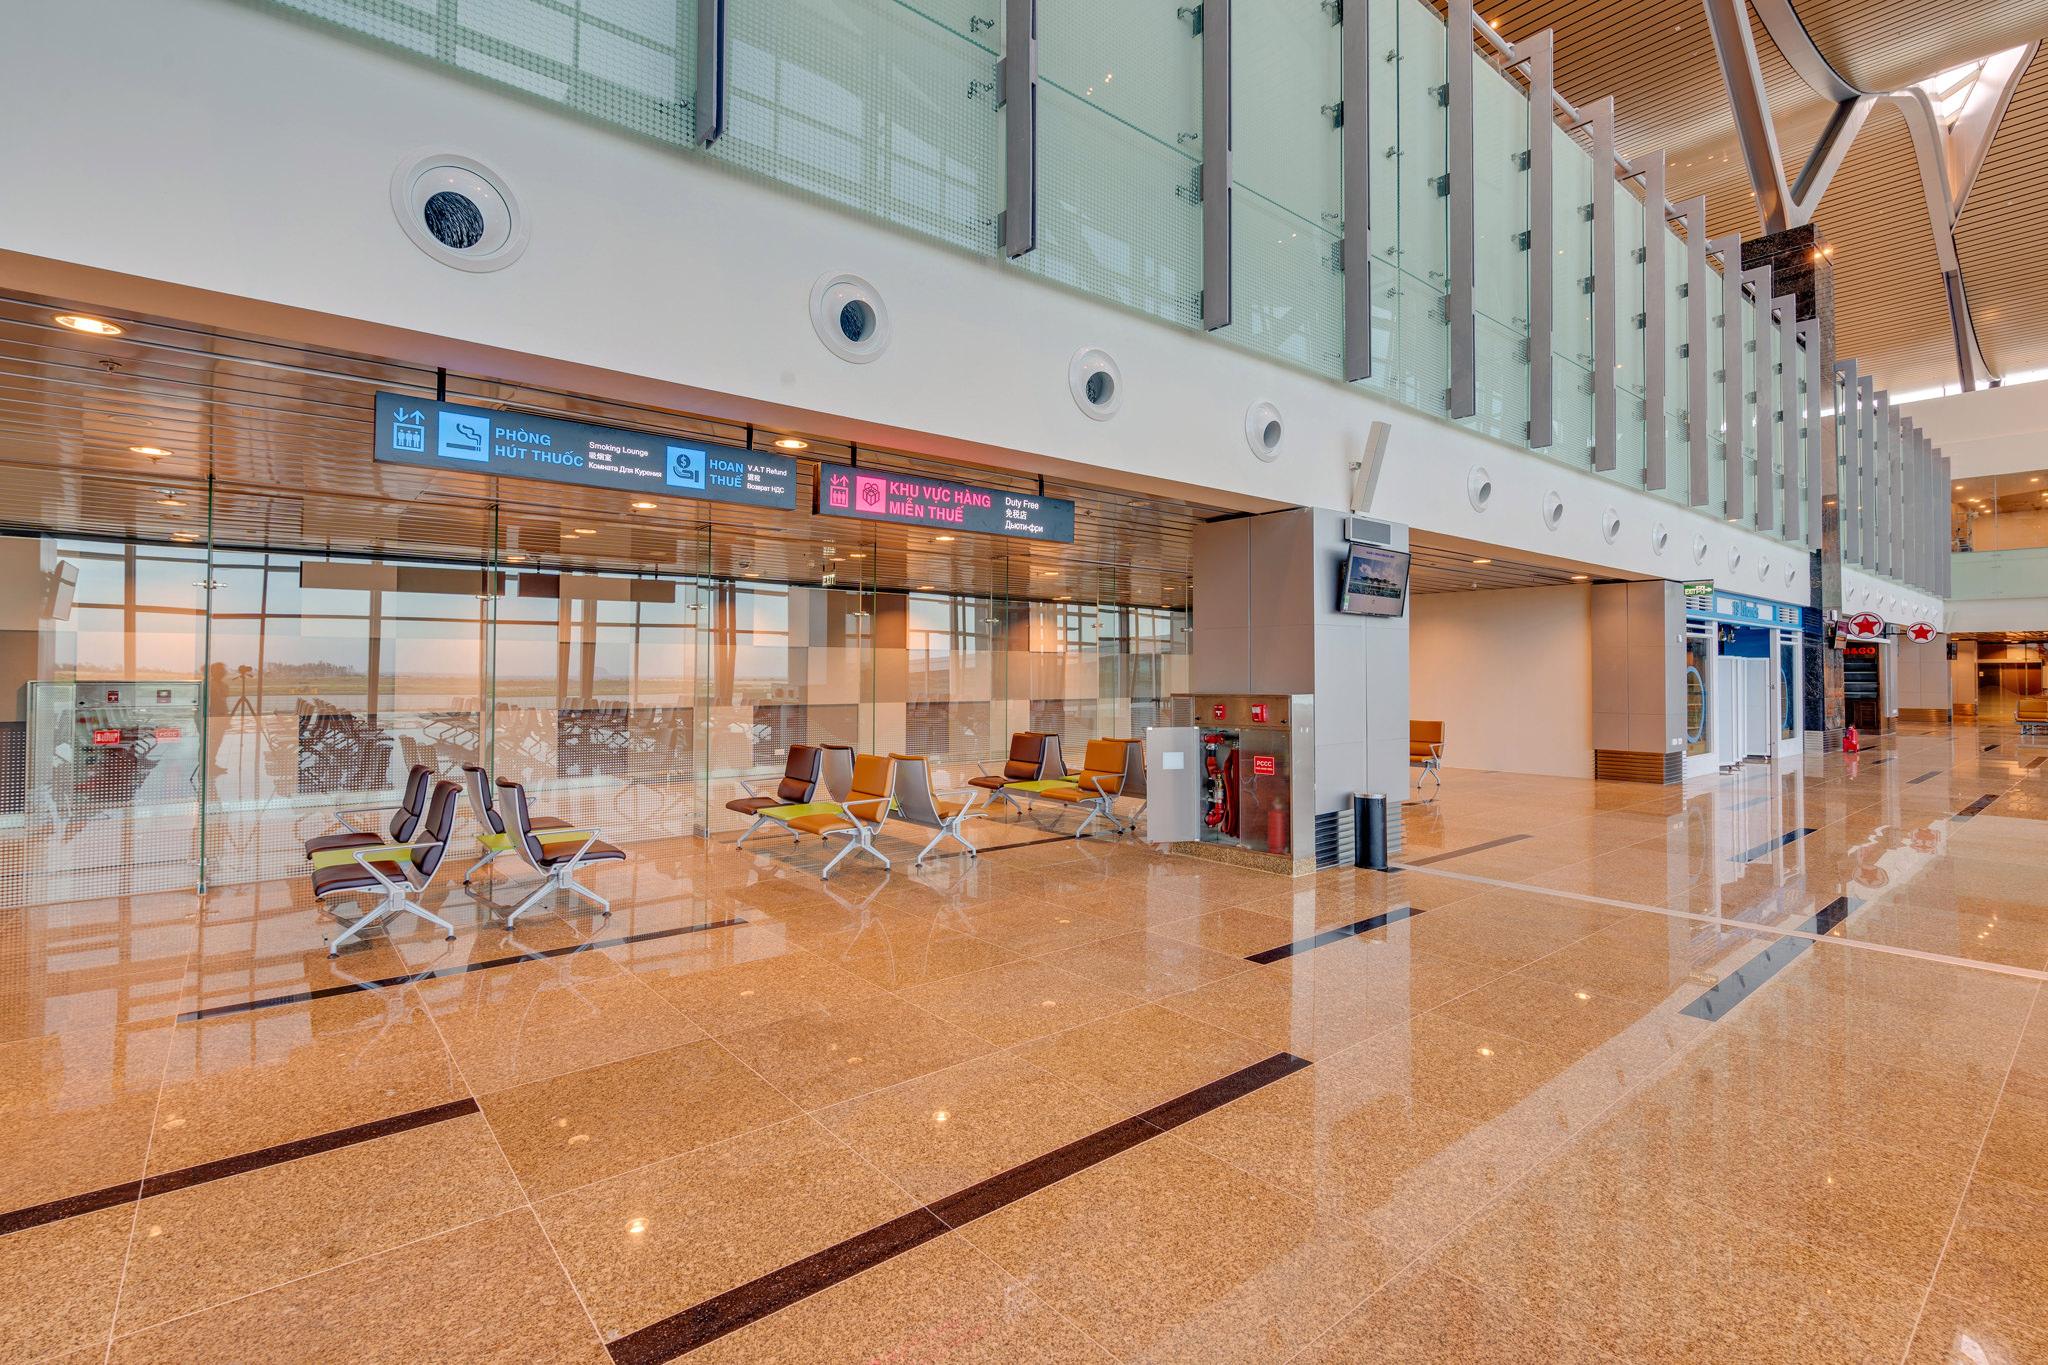 20180626 - Cam Ranh Airport - Architecture - 0356.jpg